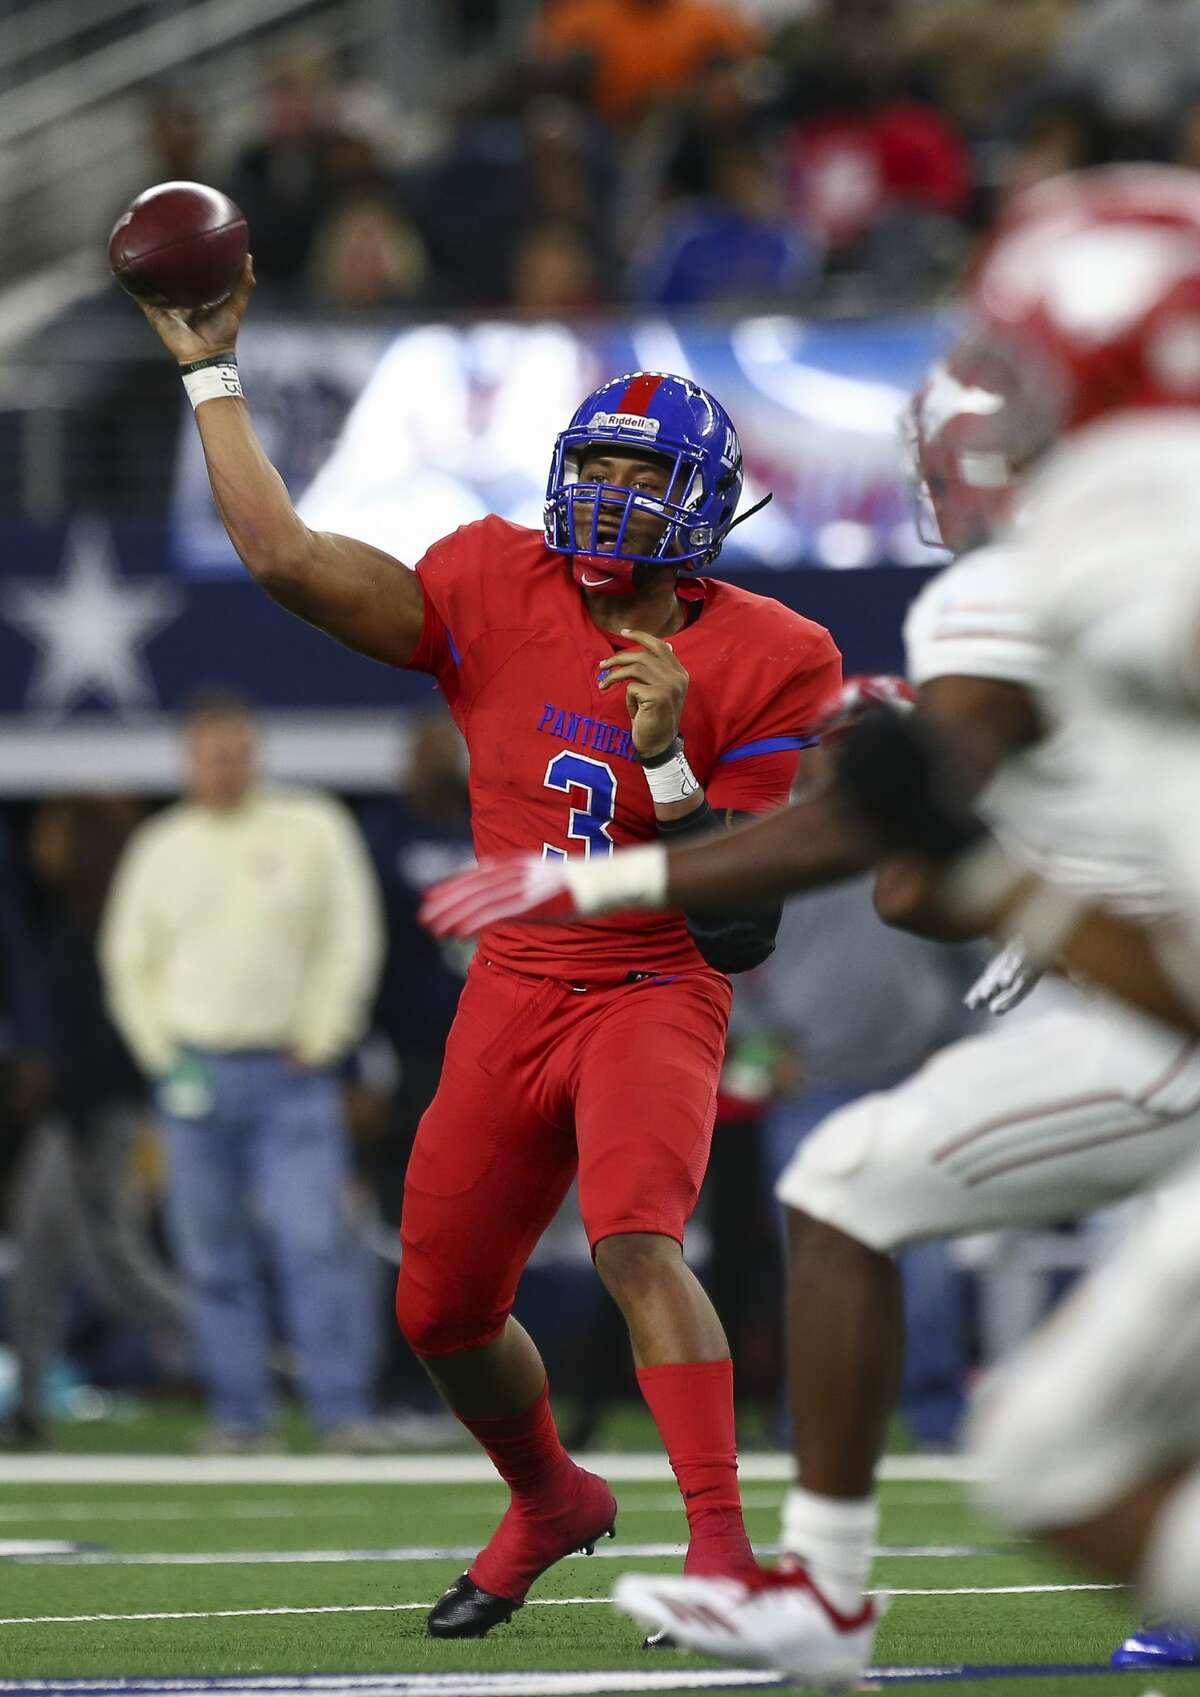 Duncanville quarterback Ja'Quinden Jackson (3) throws the ball against Galena Park North Shore during the third quarter of the 6A Division 1 State Championship against Duncanville at AT&T Stadium Saturday, Dec. 22, 2018, in Arlington, Texas. Galena Park North Shore won 41-36.